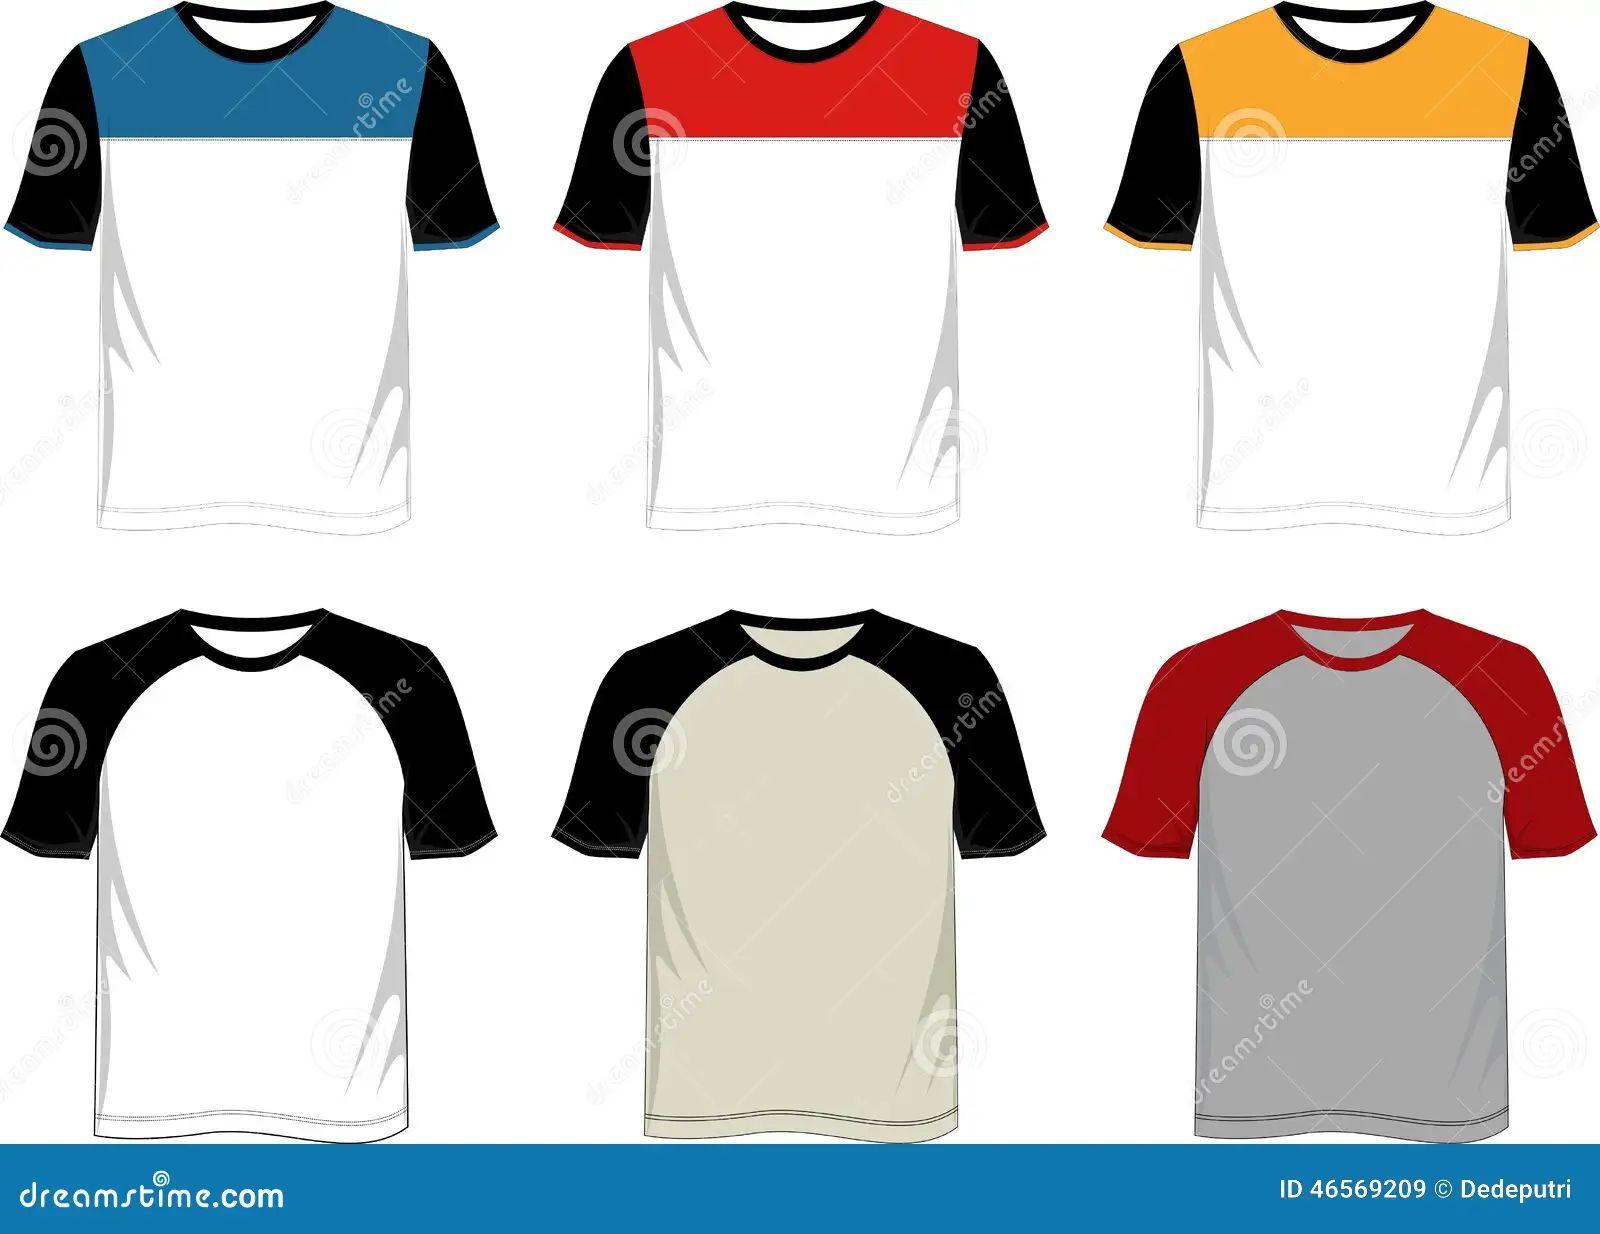 Black t shirt vector ai - Black T Shirt Vector Free Royalty Free Vector Black Download